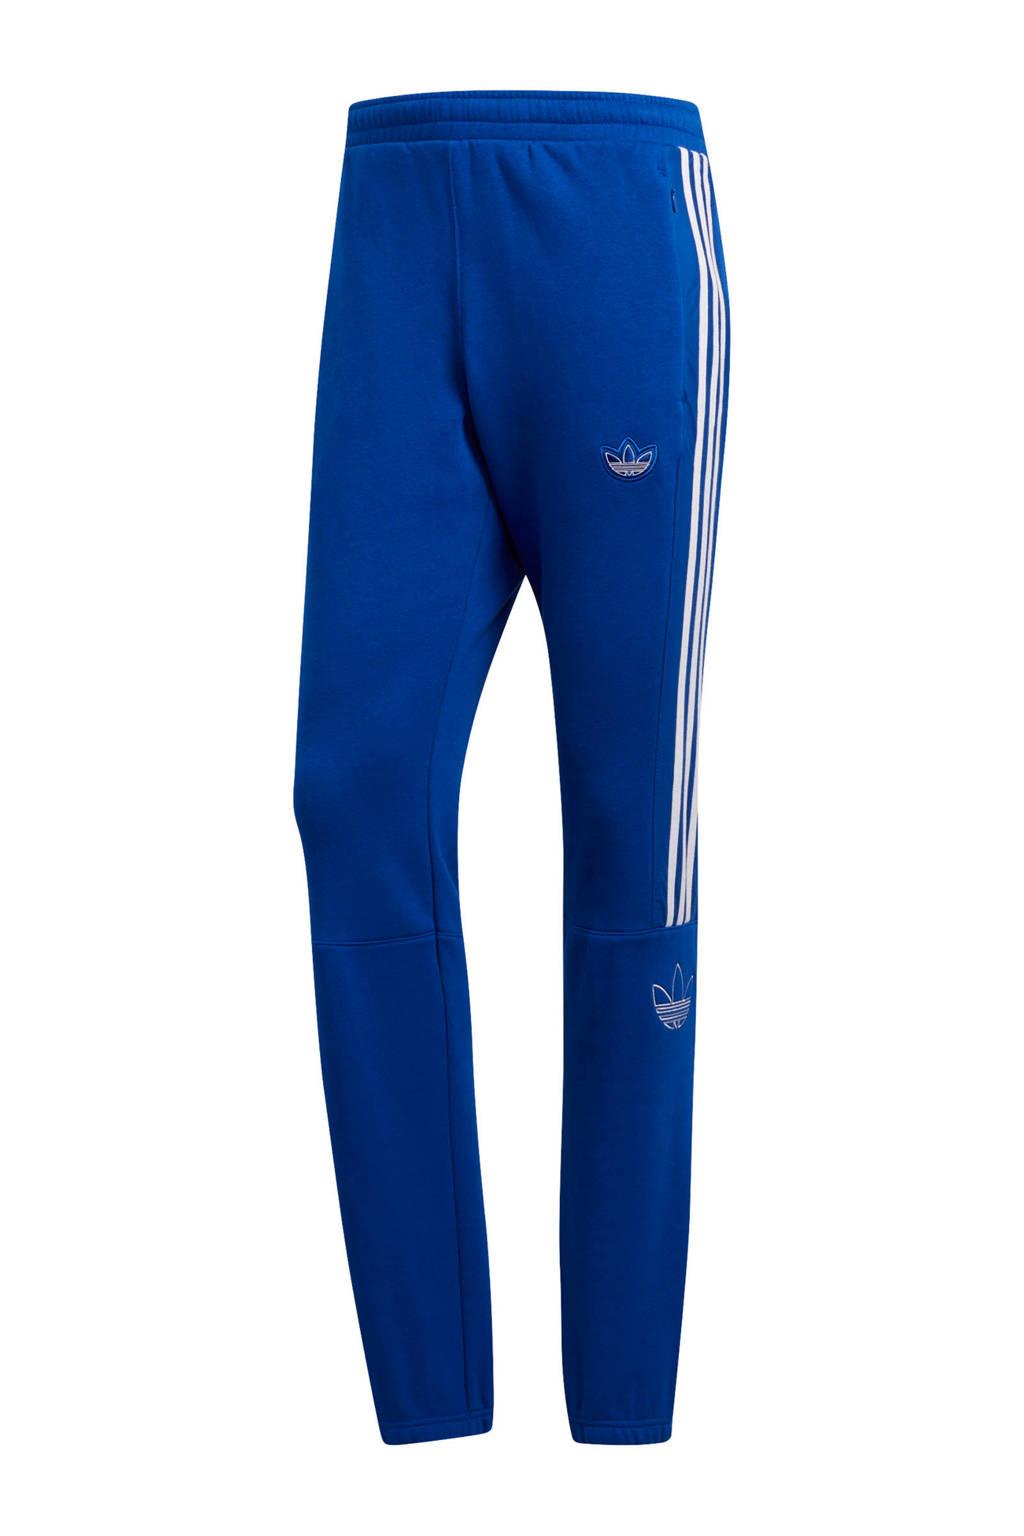 adidas originals jogginbroek blauw, Blauw/wit